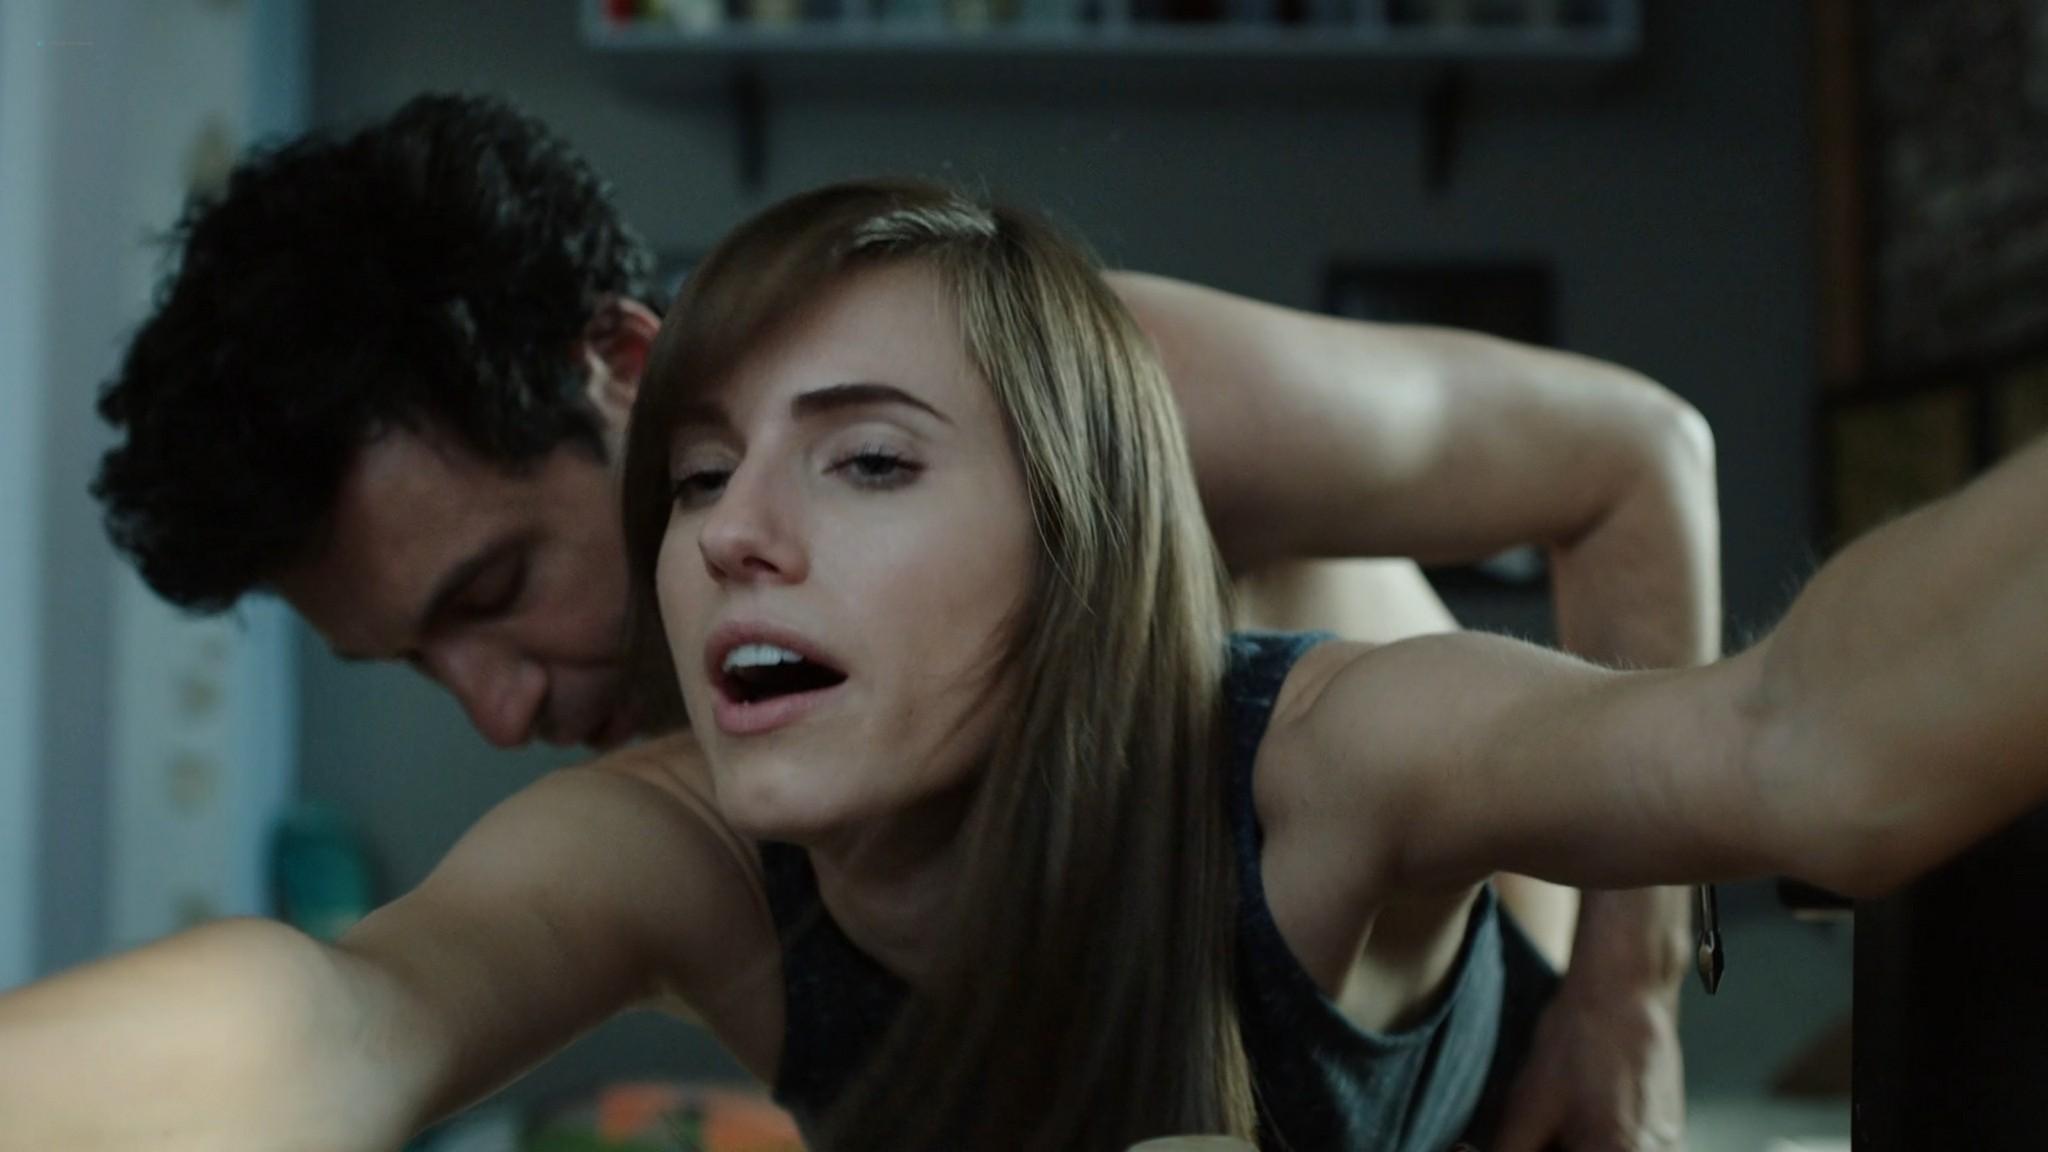 Jemima Kirke nude full frontal Lena Dunham Daisy Eagan nude Allison Williams sexy Girls 2012 s6e1 4 1080p Web 14